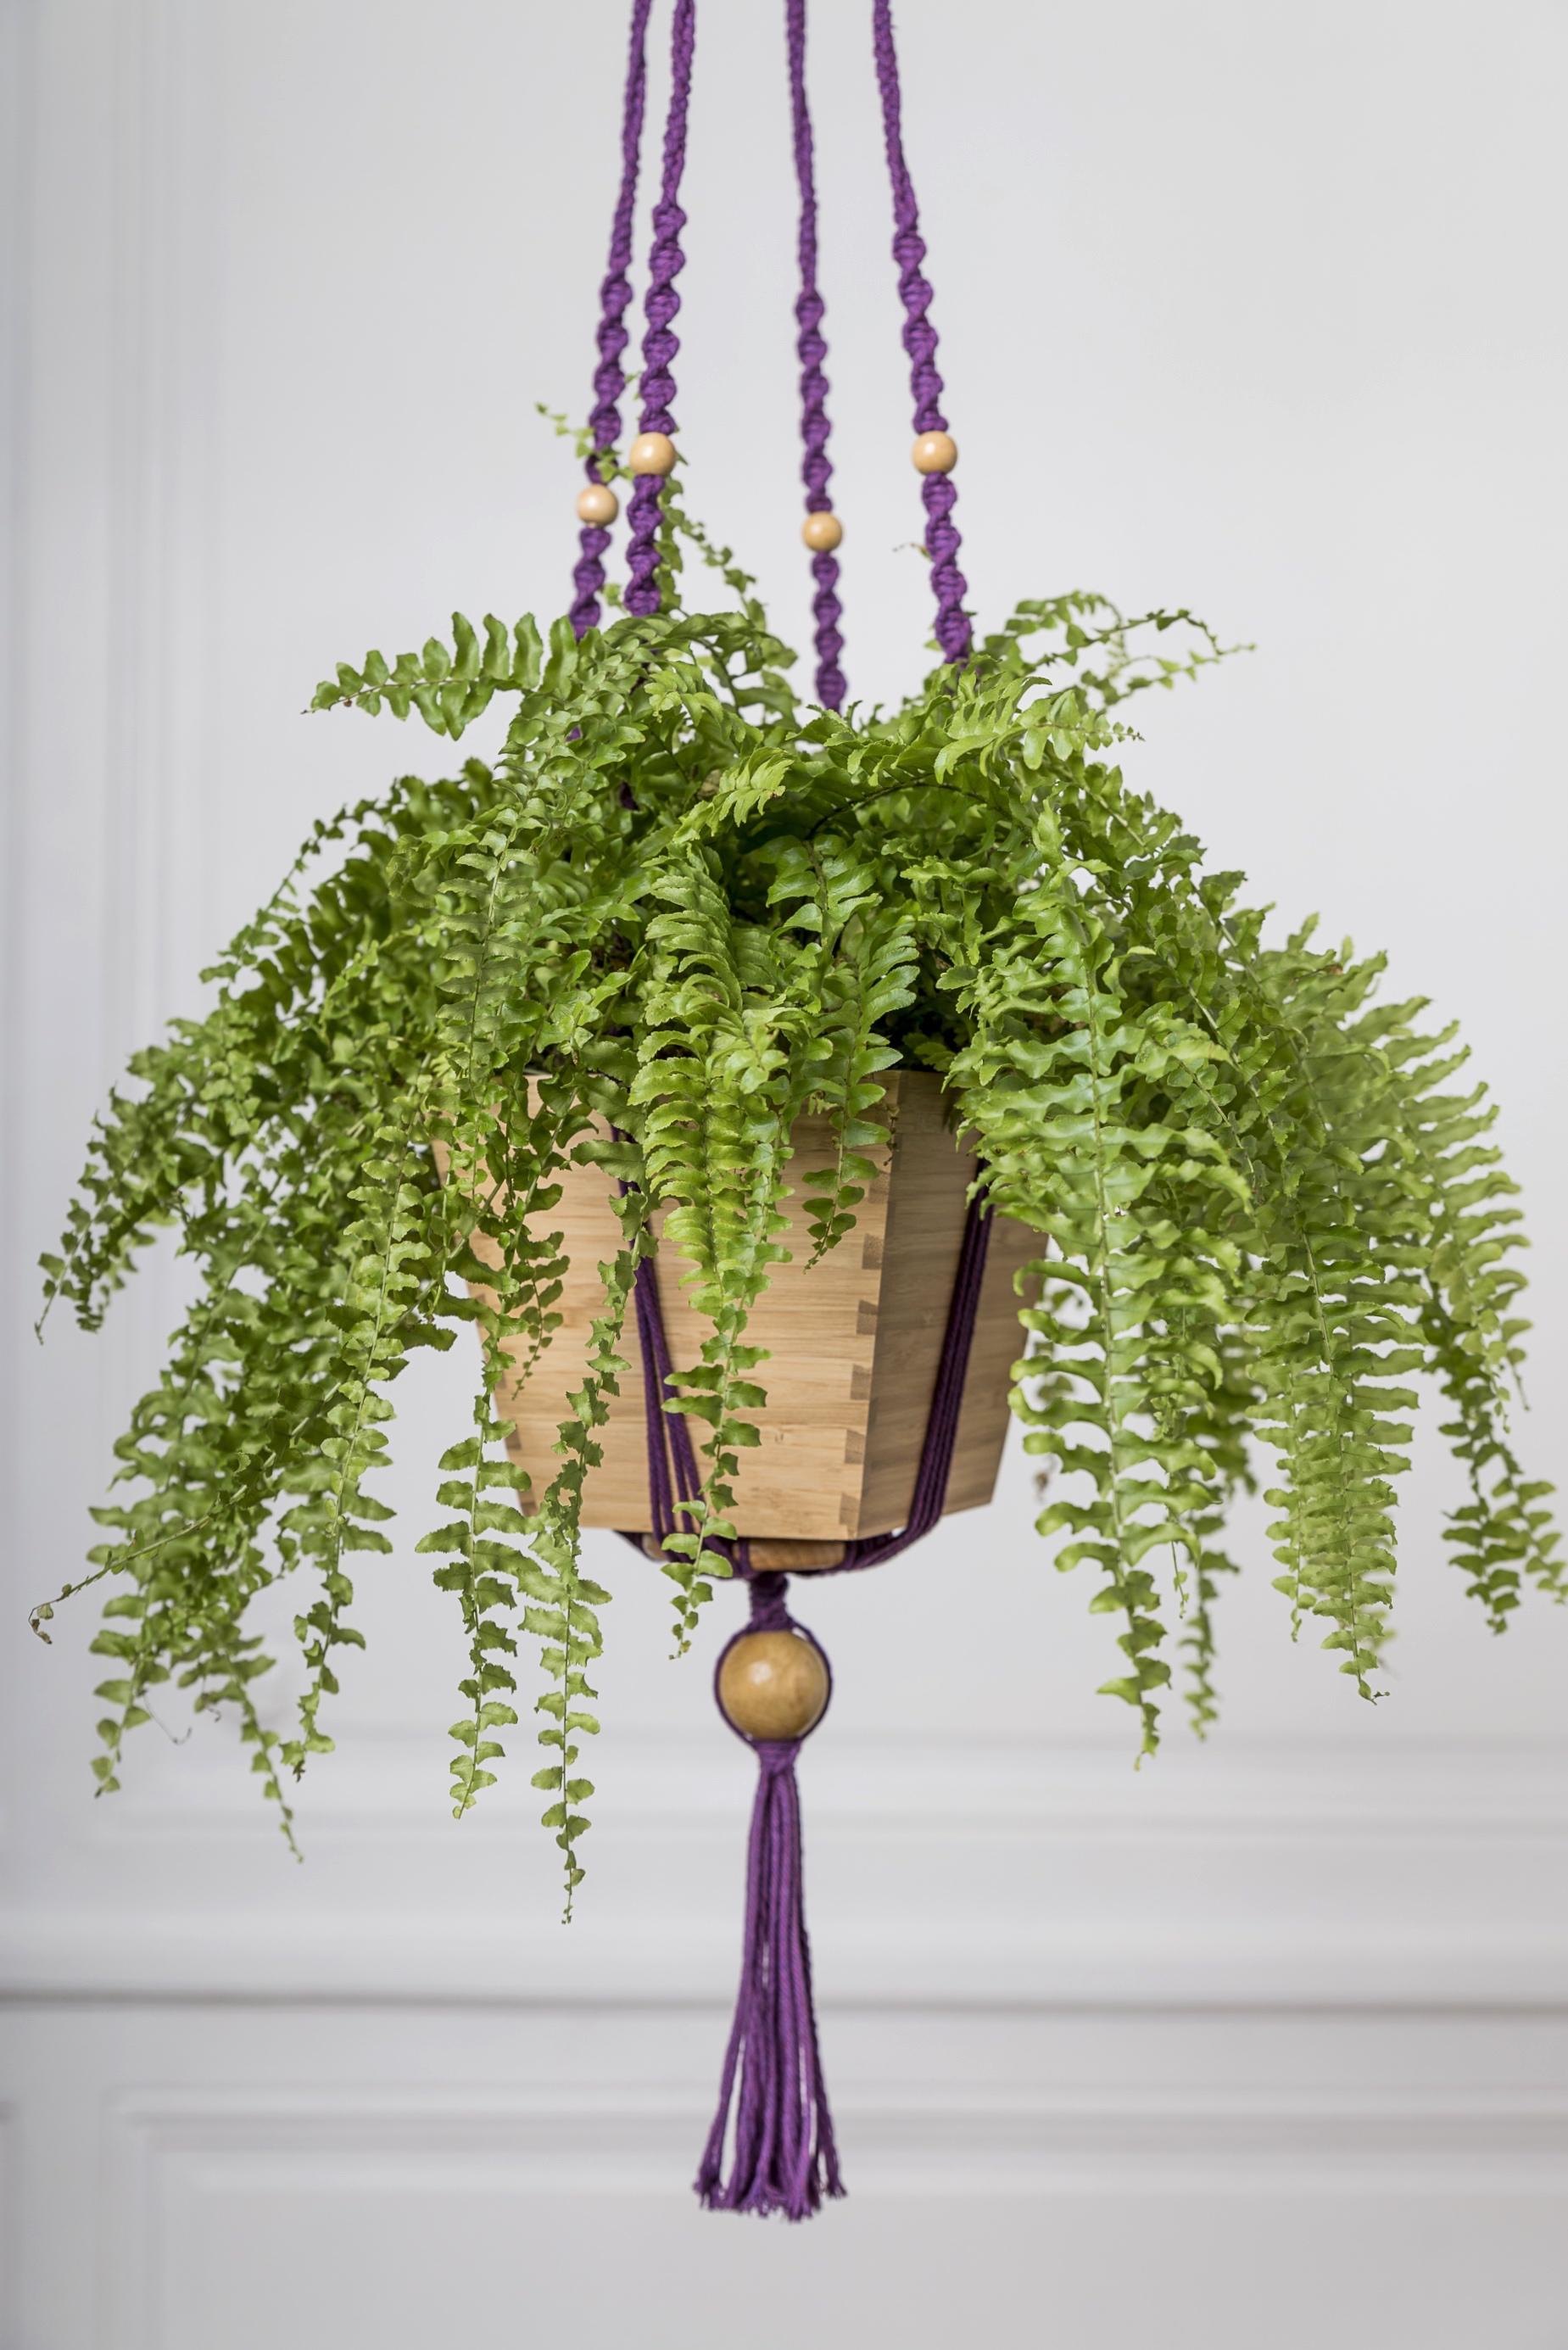 suspension pour plante en macram bymadjo 025 tynka d co. Black Bedroom Furniture Sets. Home Design Ideas